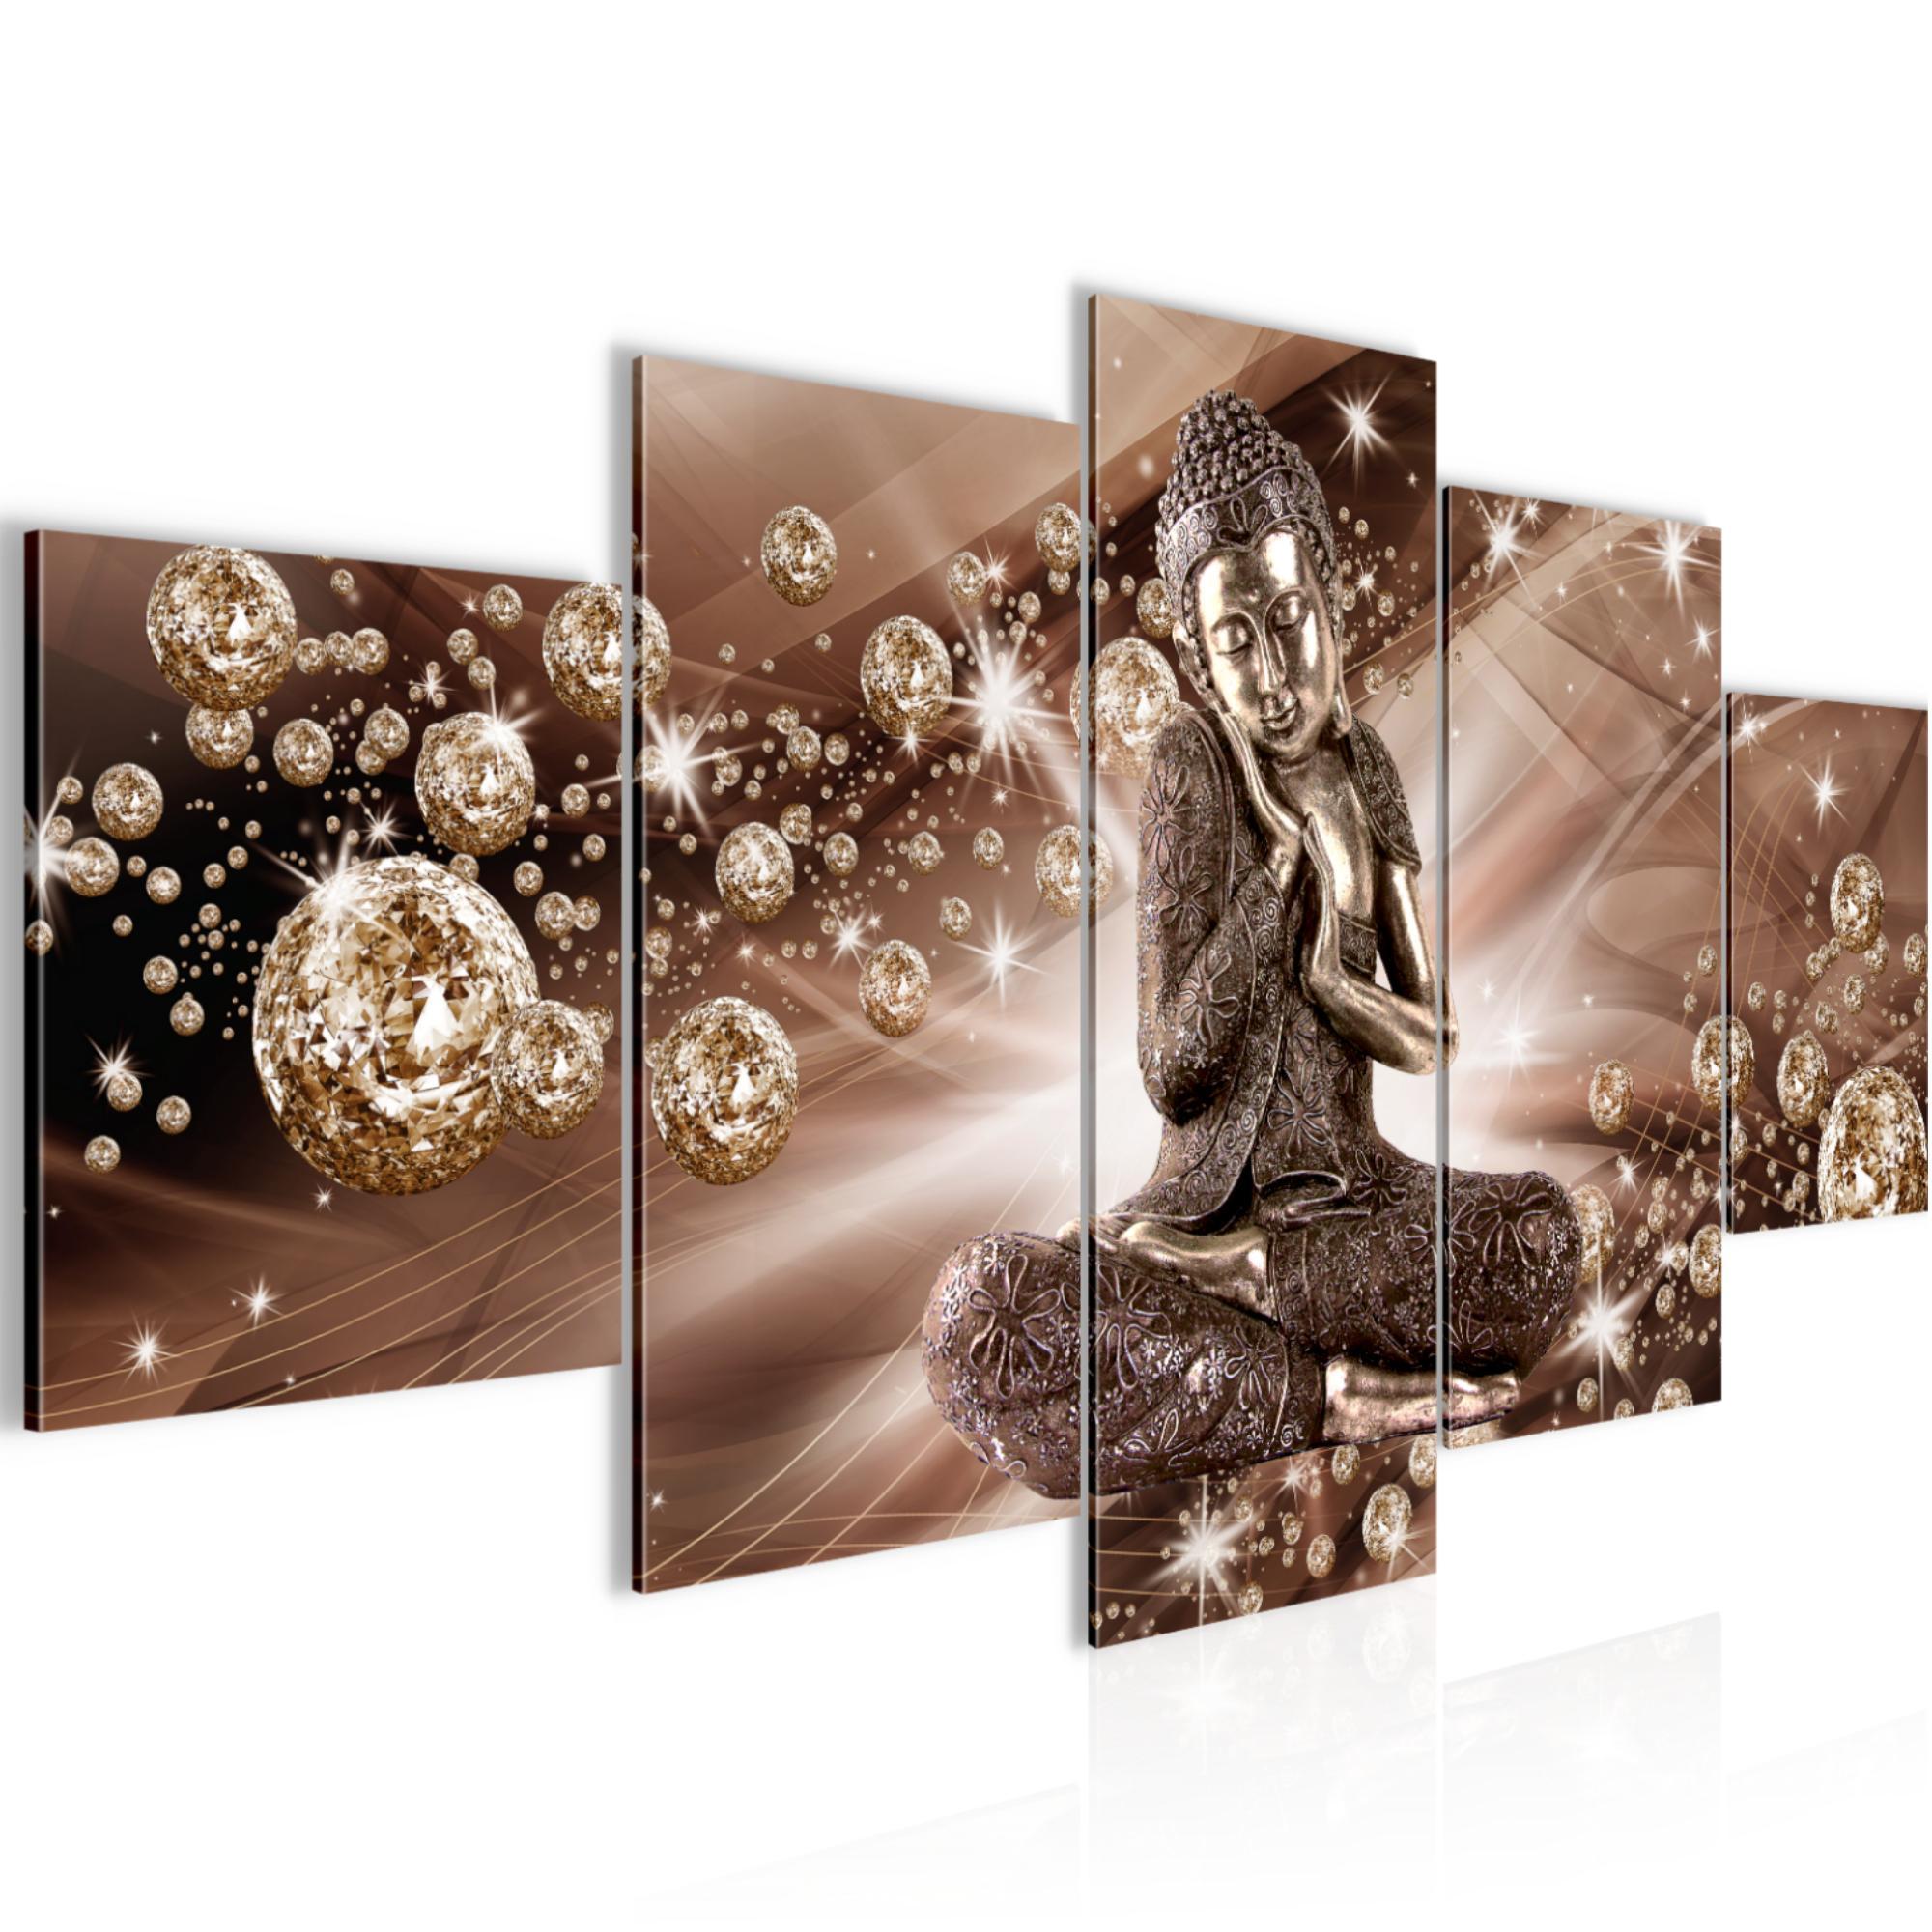 Buddha Bild Bilder Wandbild XXL 200x100 cm Leinwand aus Vlies Kunstdruck